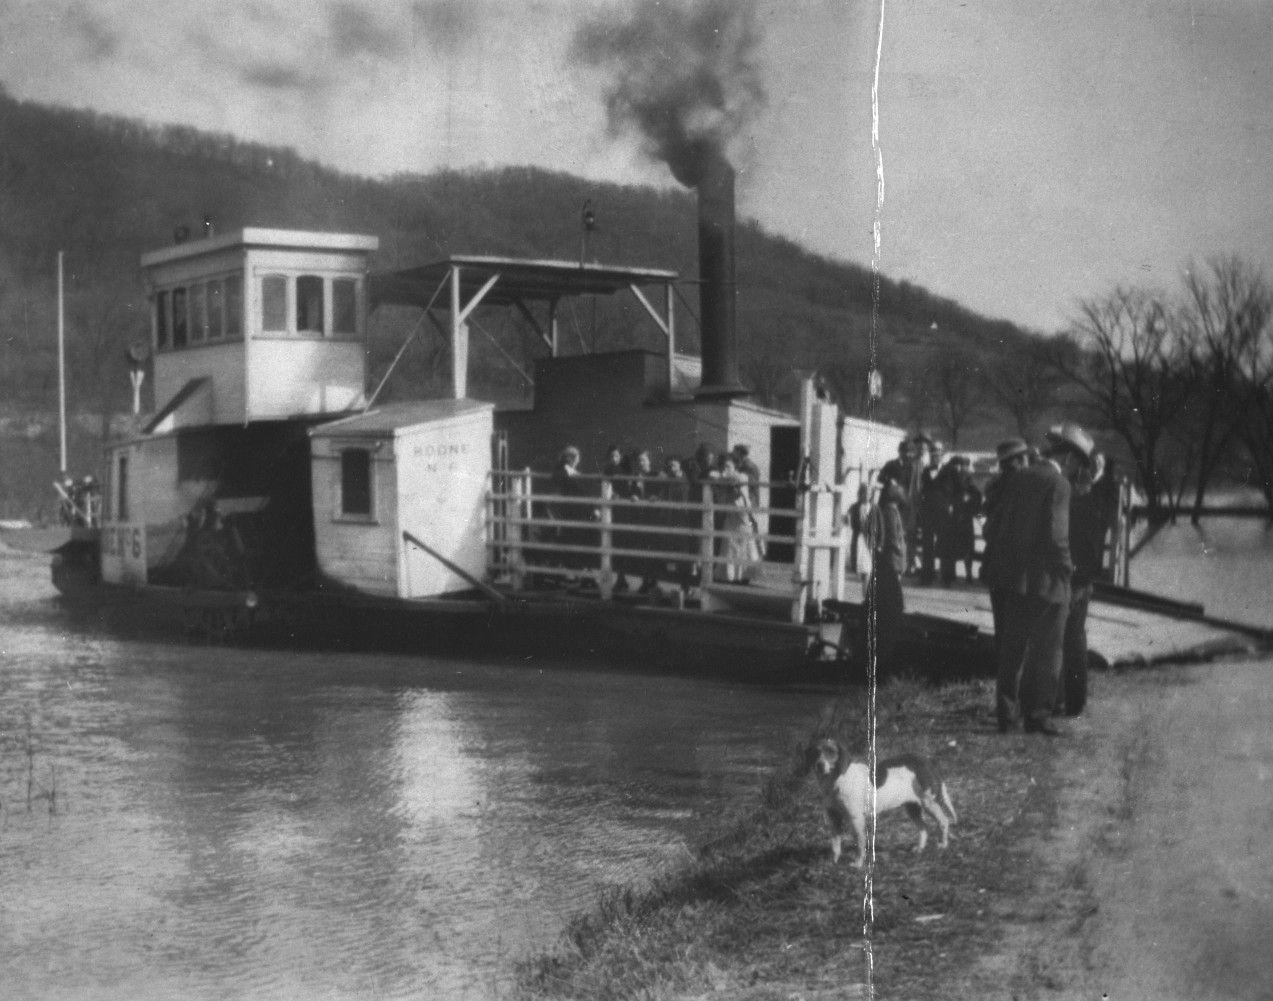 Boone No 6 Ferry Boat Description Sidewheel